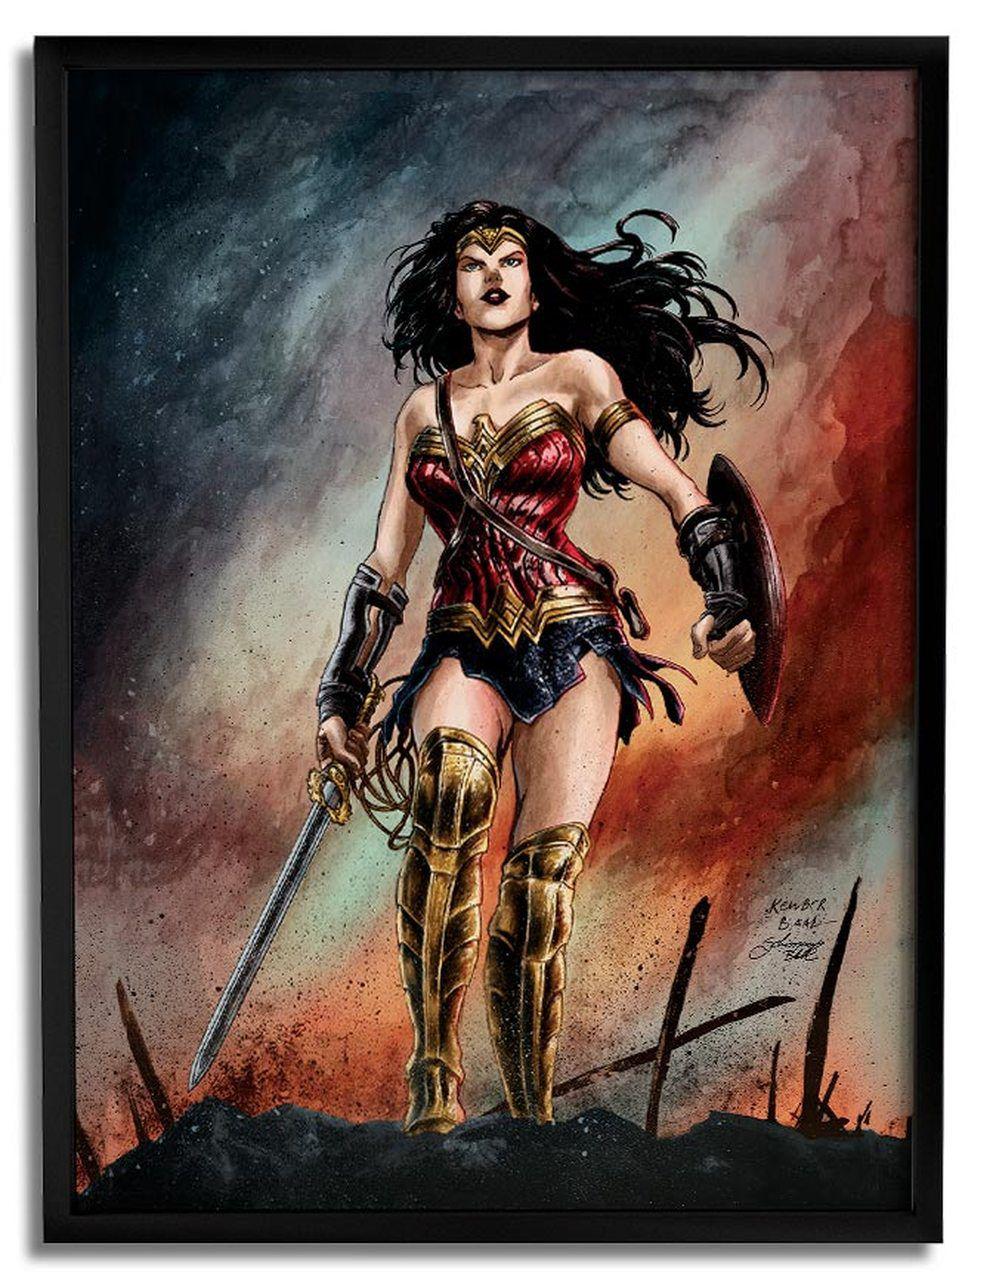 Quadro Mulher-Maravilha (Wonder Woman): Liga da Justiça (Justice League)